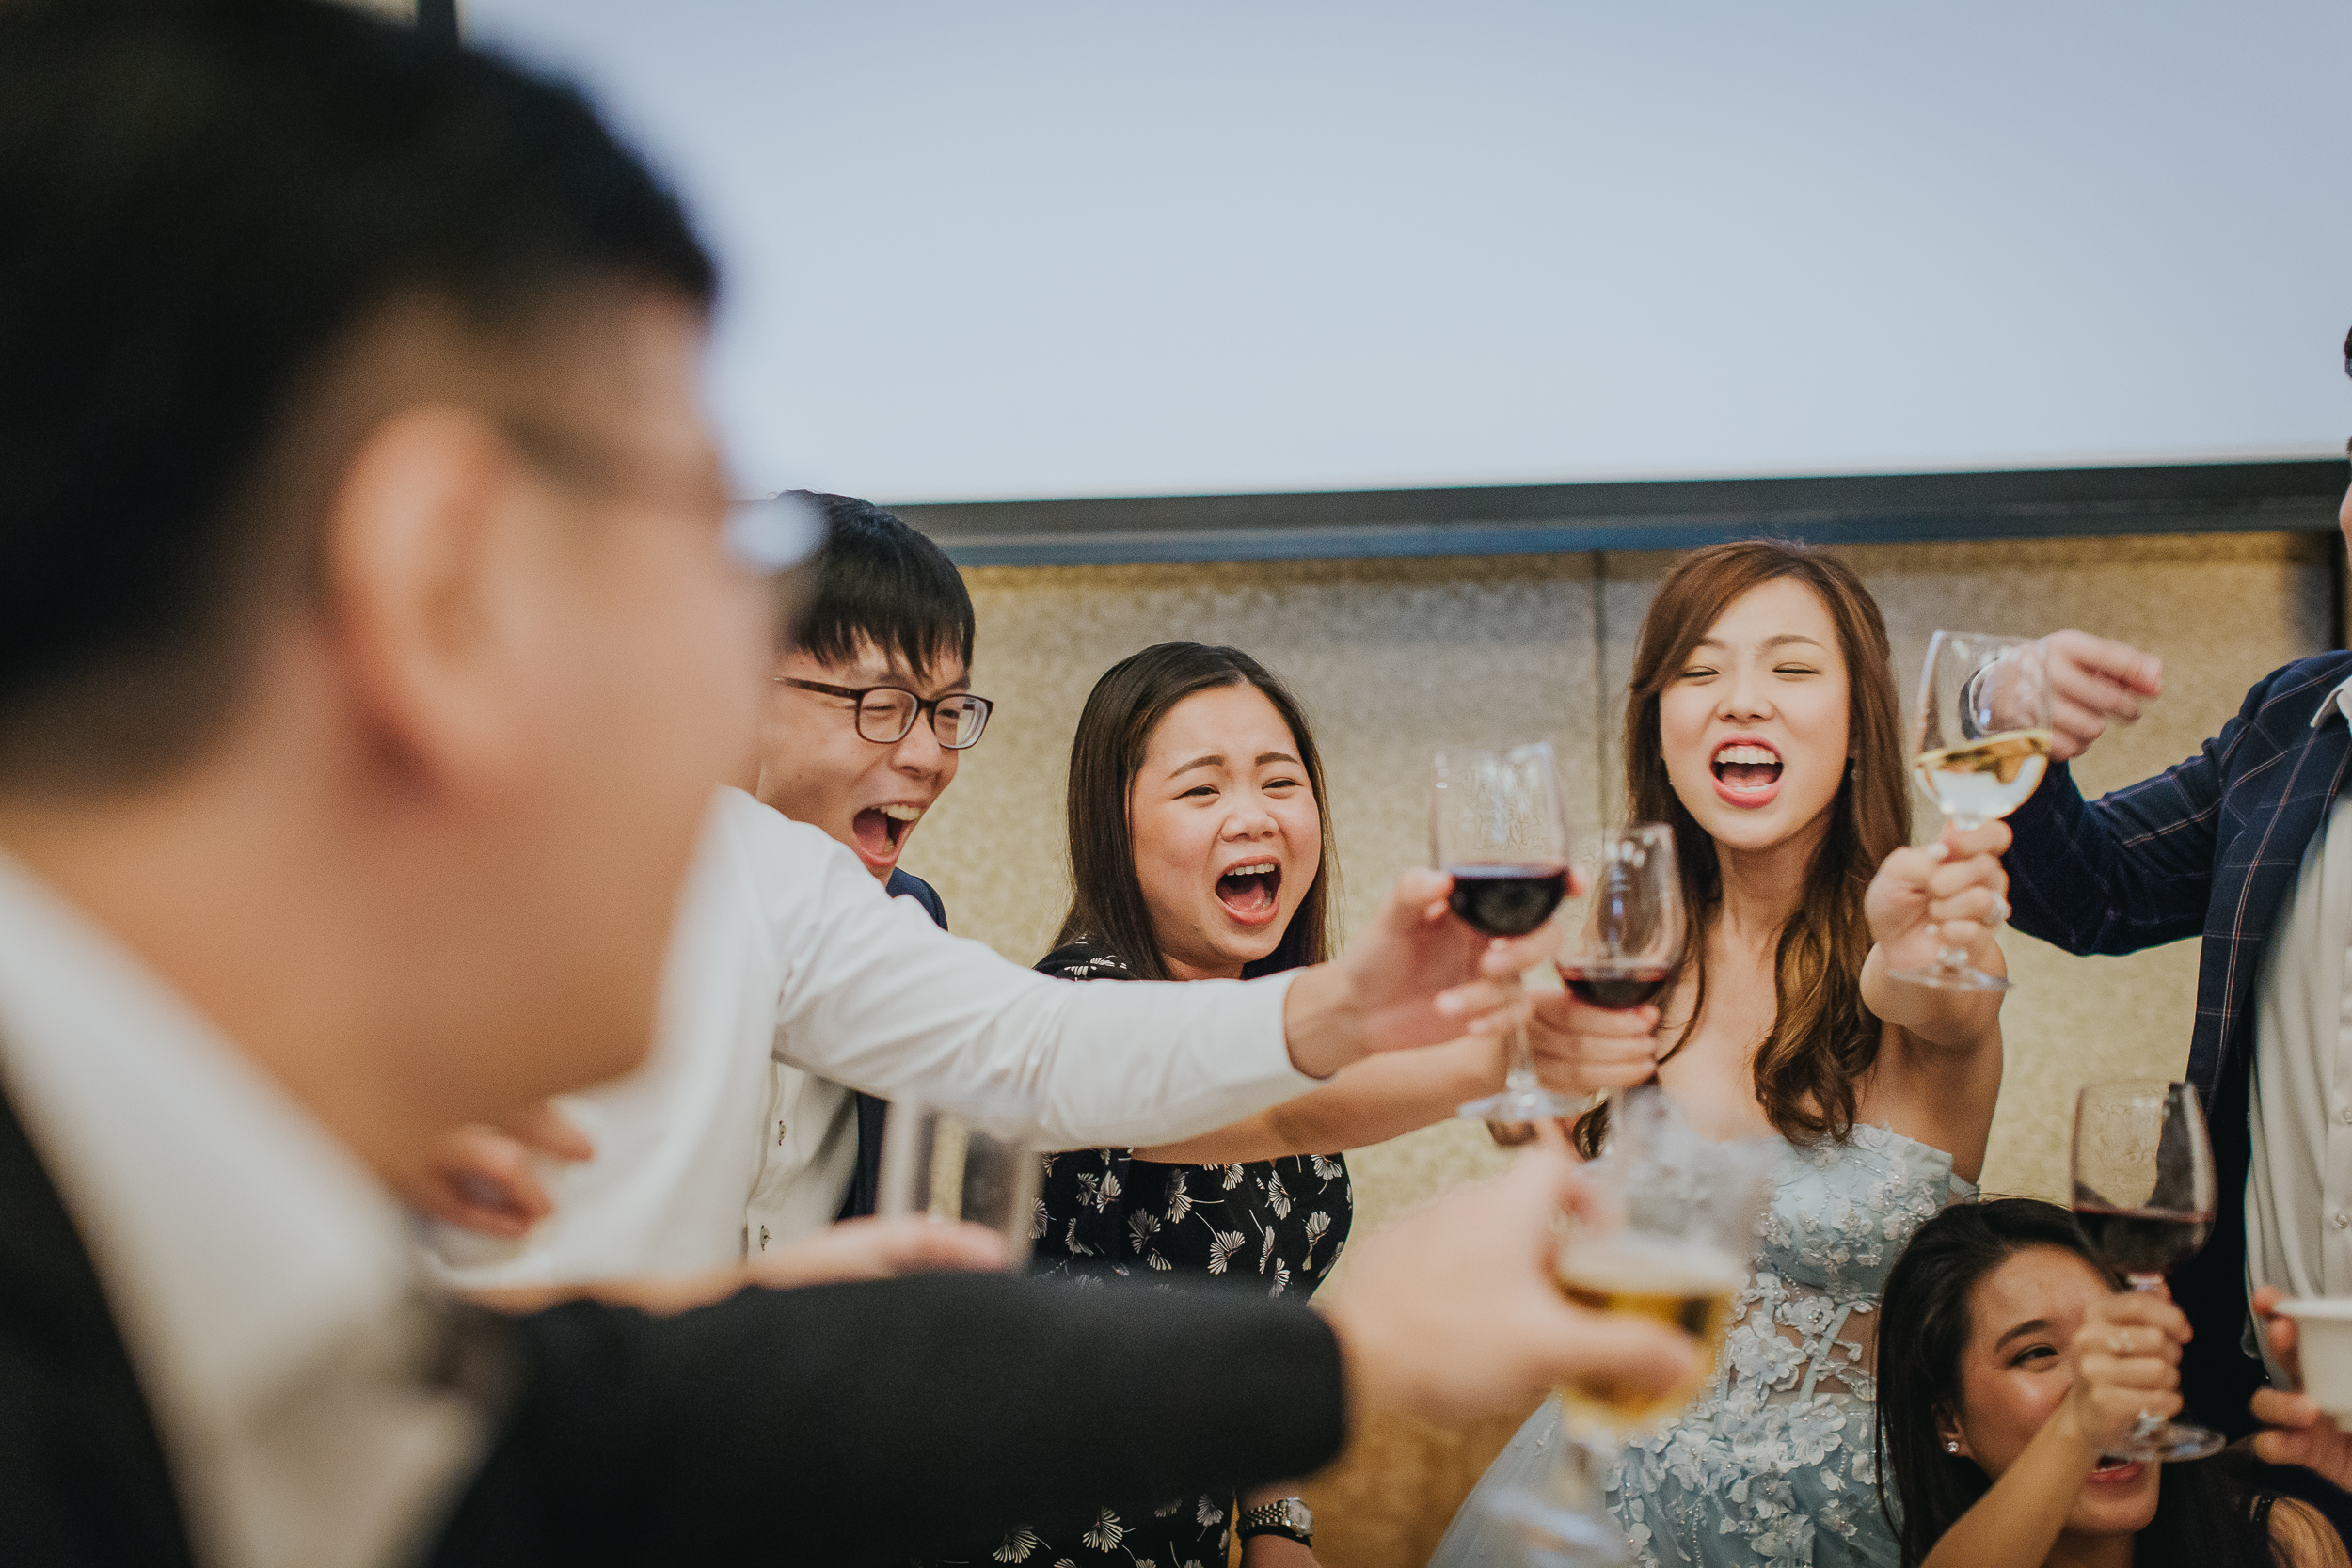 Singapore+Actual+Day+Wedding+Photographer+Grand+Mercure+Oliver+Estelle-0105.jpg